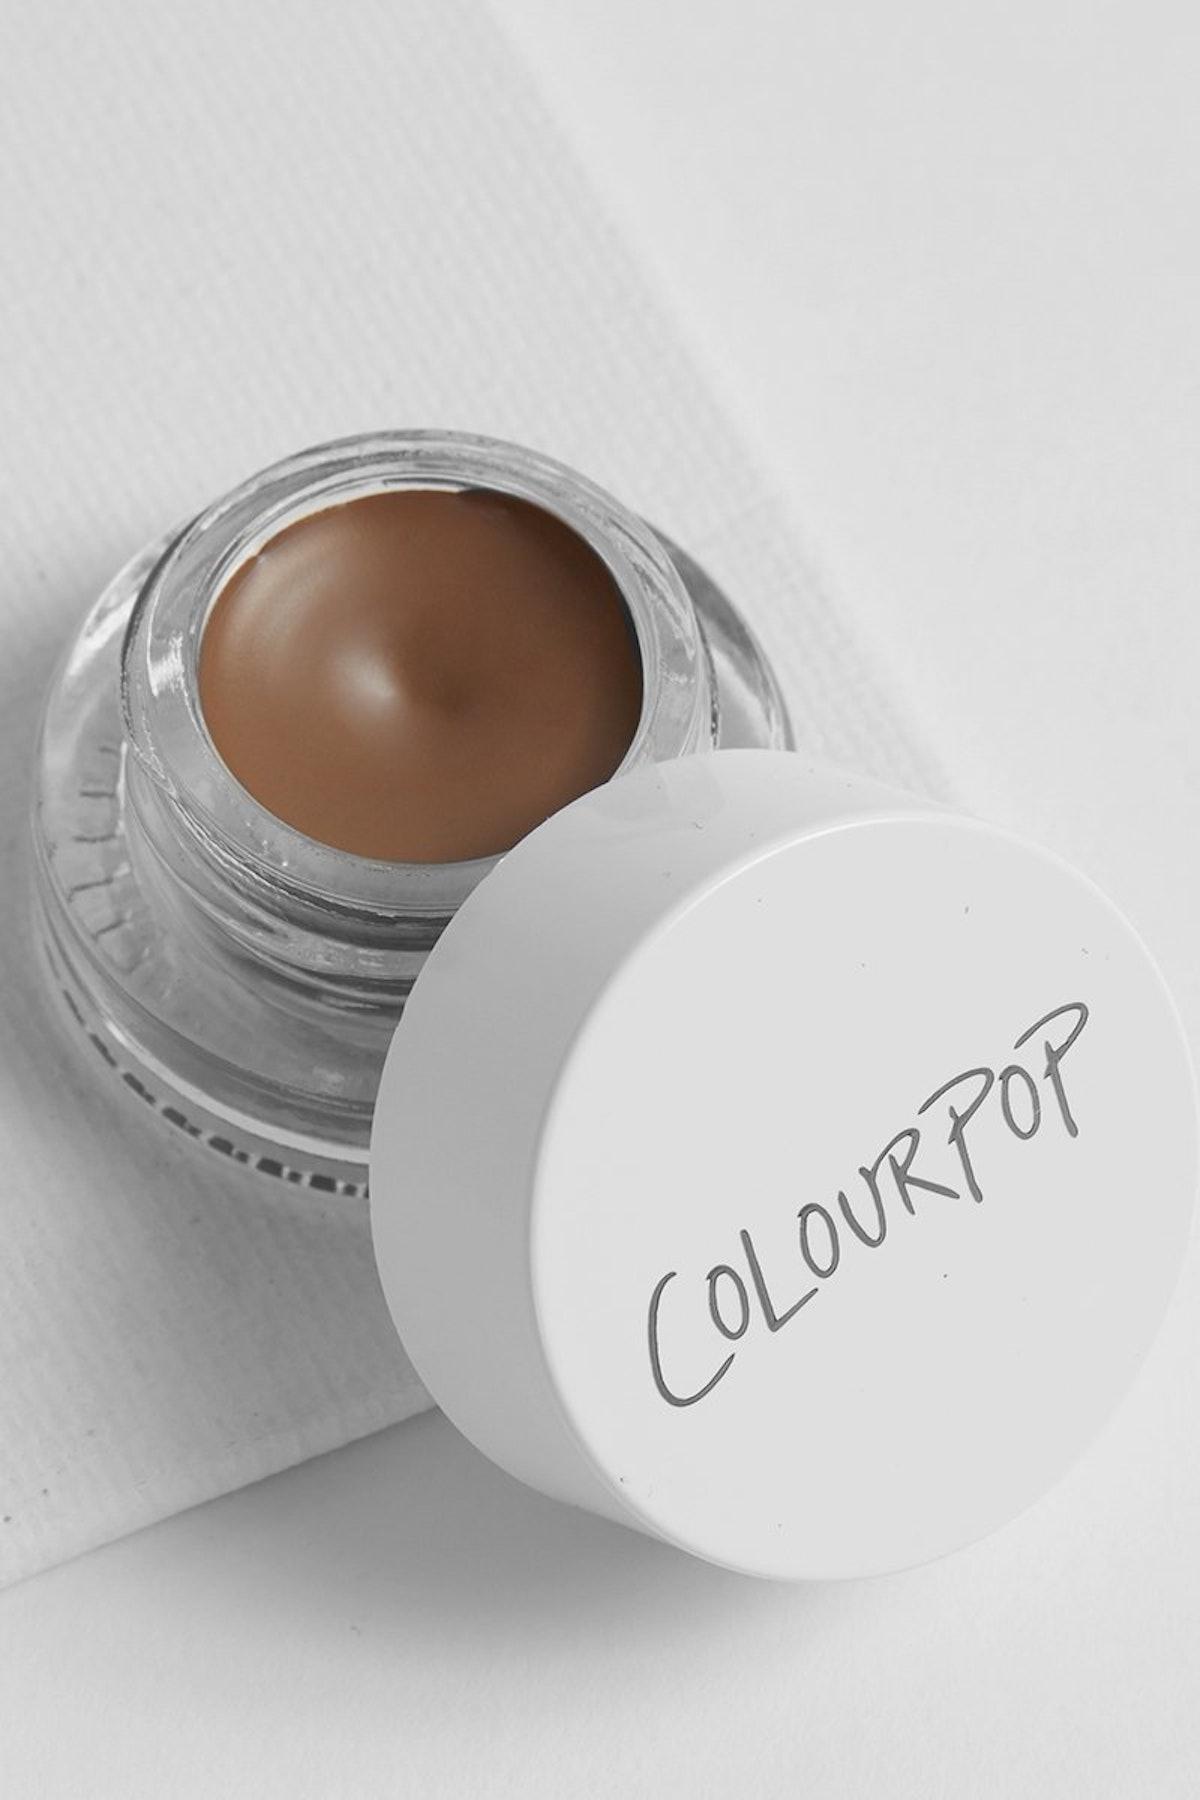 DOPE TAUPE Precision Brow Colour